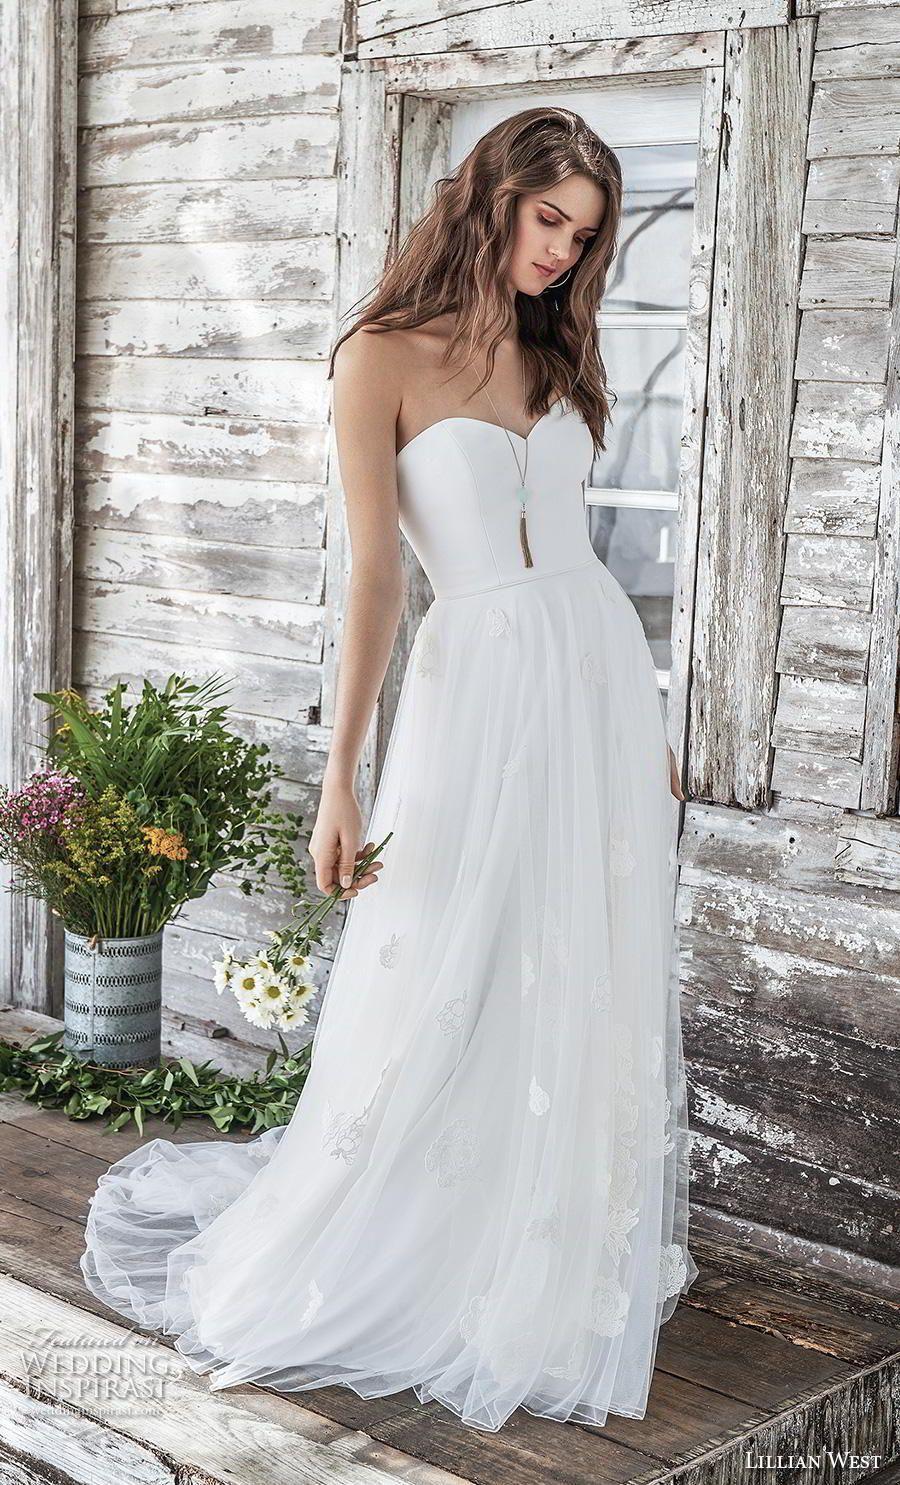 Best wedding dresses for 50 year olds  Lillian West Spring  Wedding Dresses  weddingHERS  Pinterest